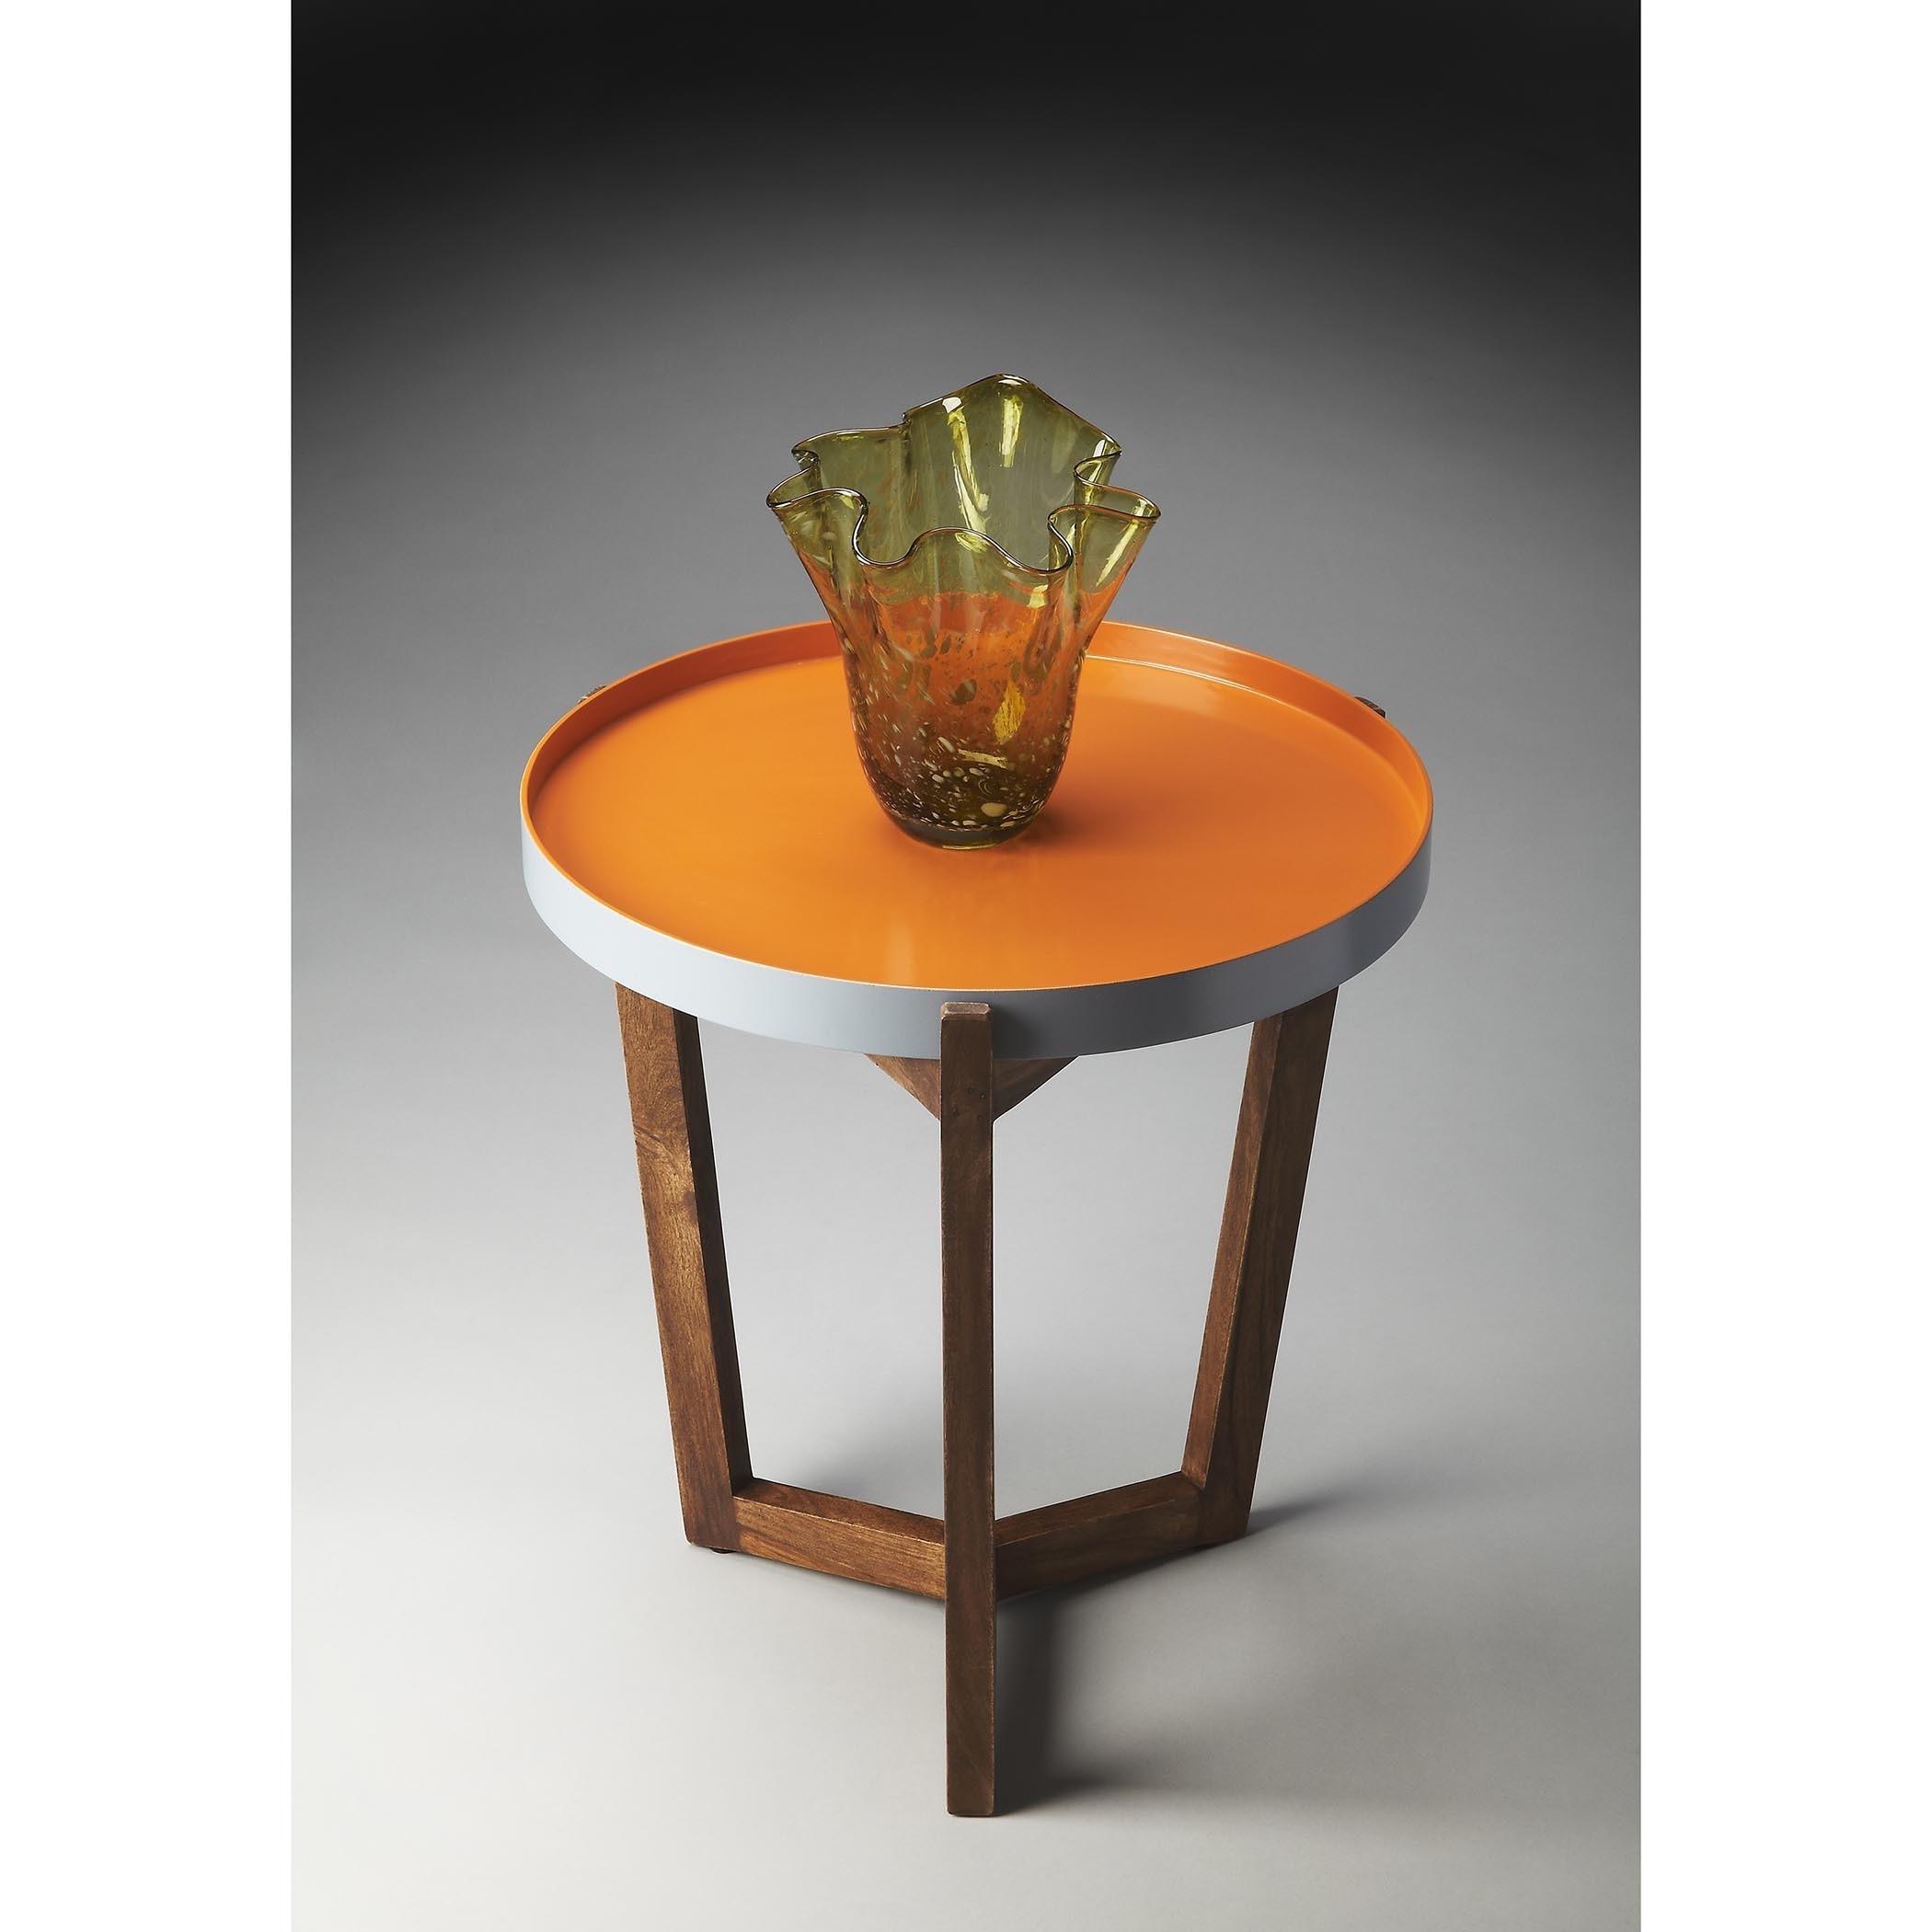 Butler Buter Loft Tray Table (Multi-Color), Brown